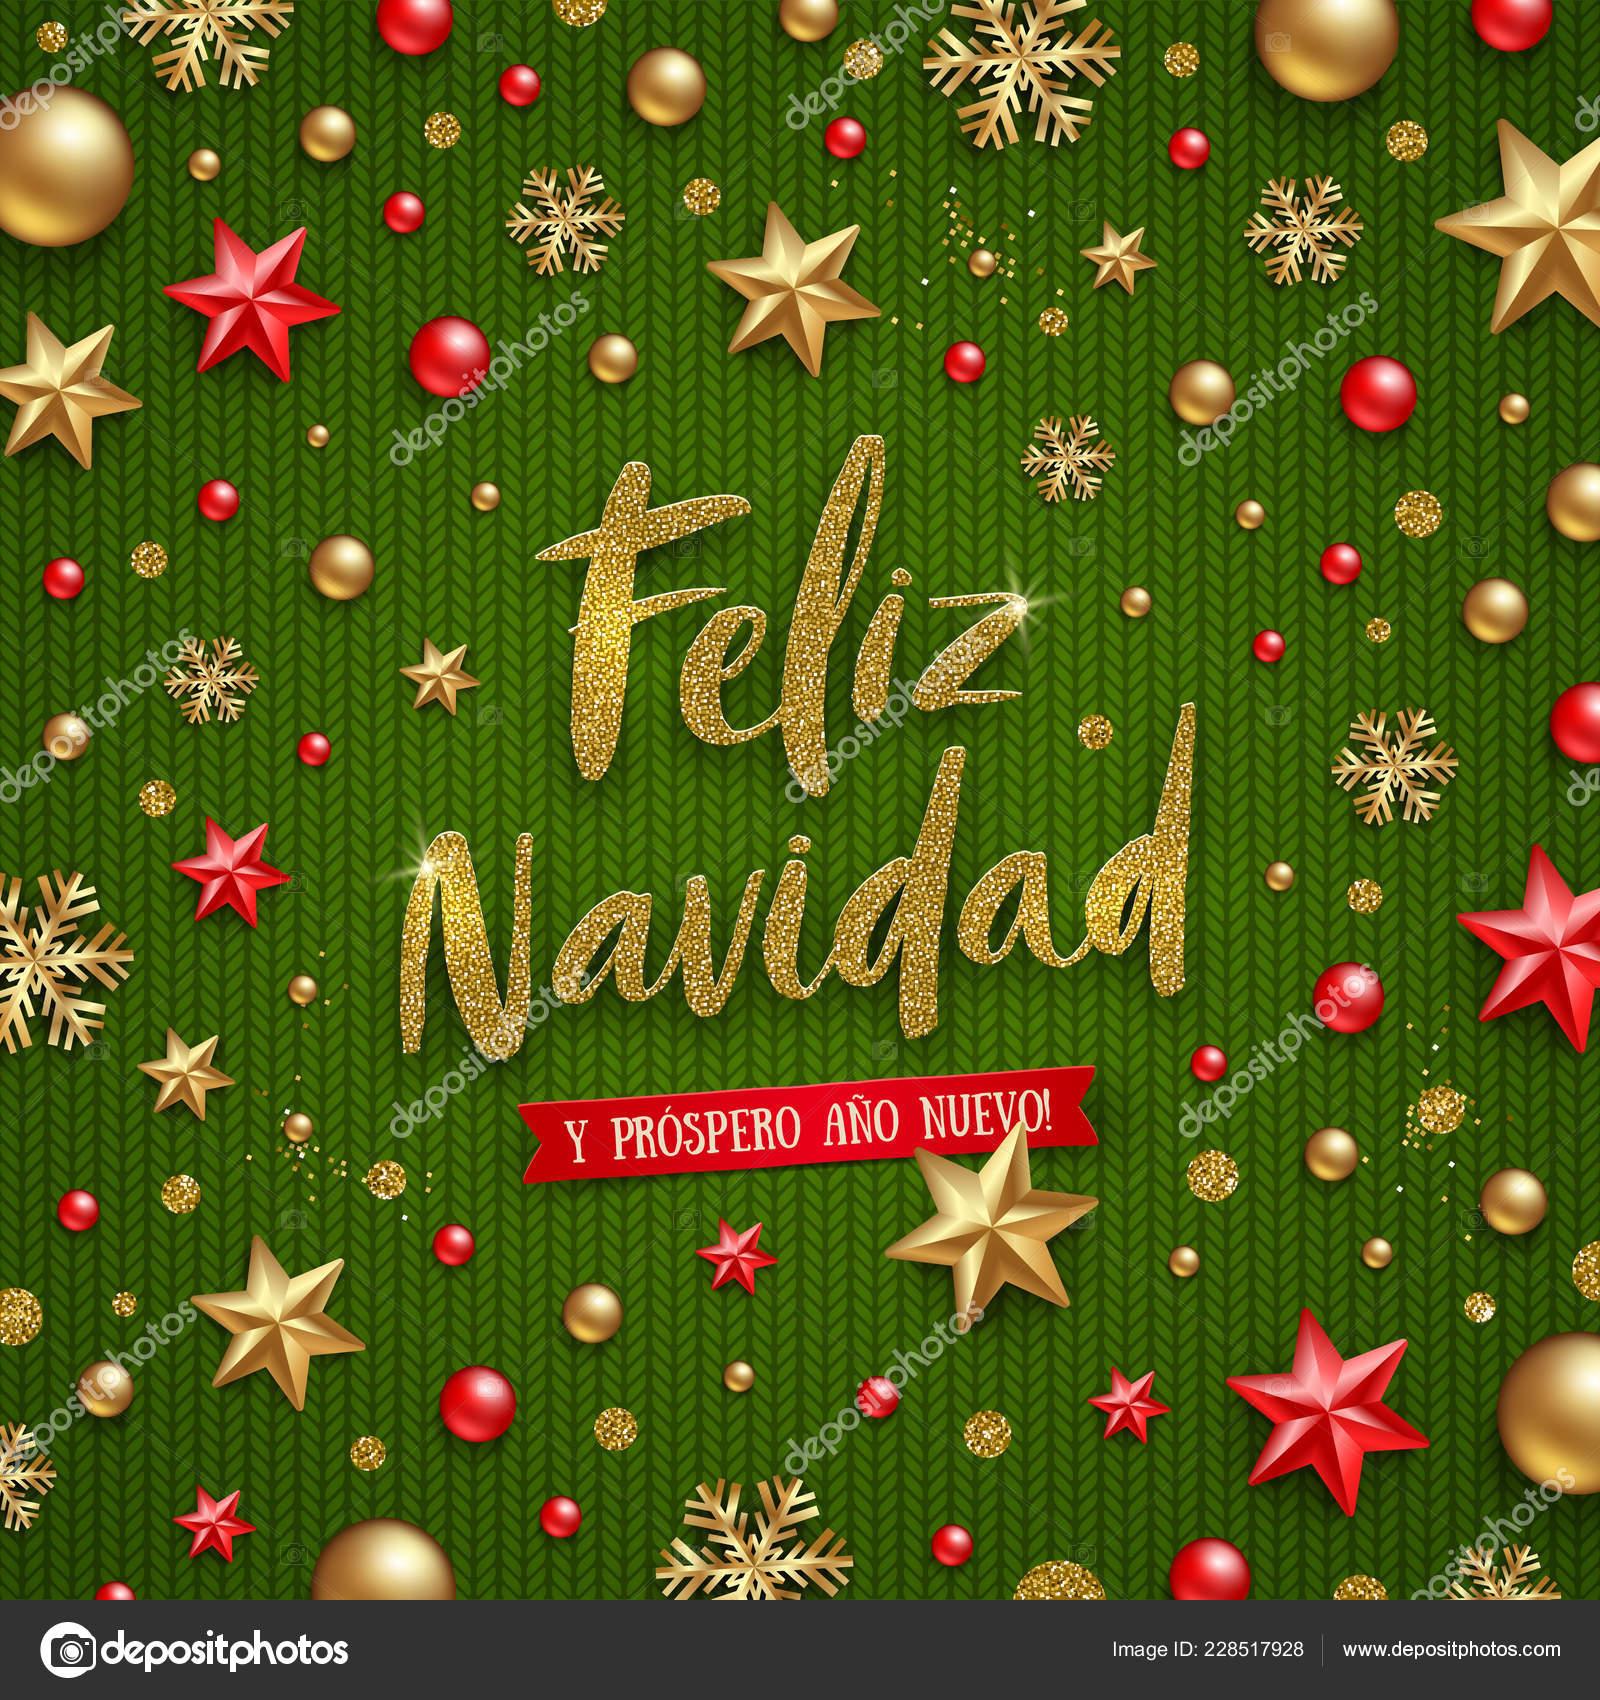 Christmas Wishes In Spanish.Feliz Navidad Christmas Greetings Spanish Glitter Gold